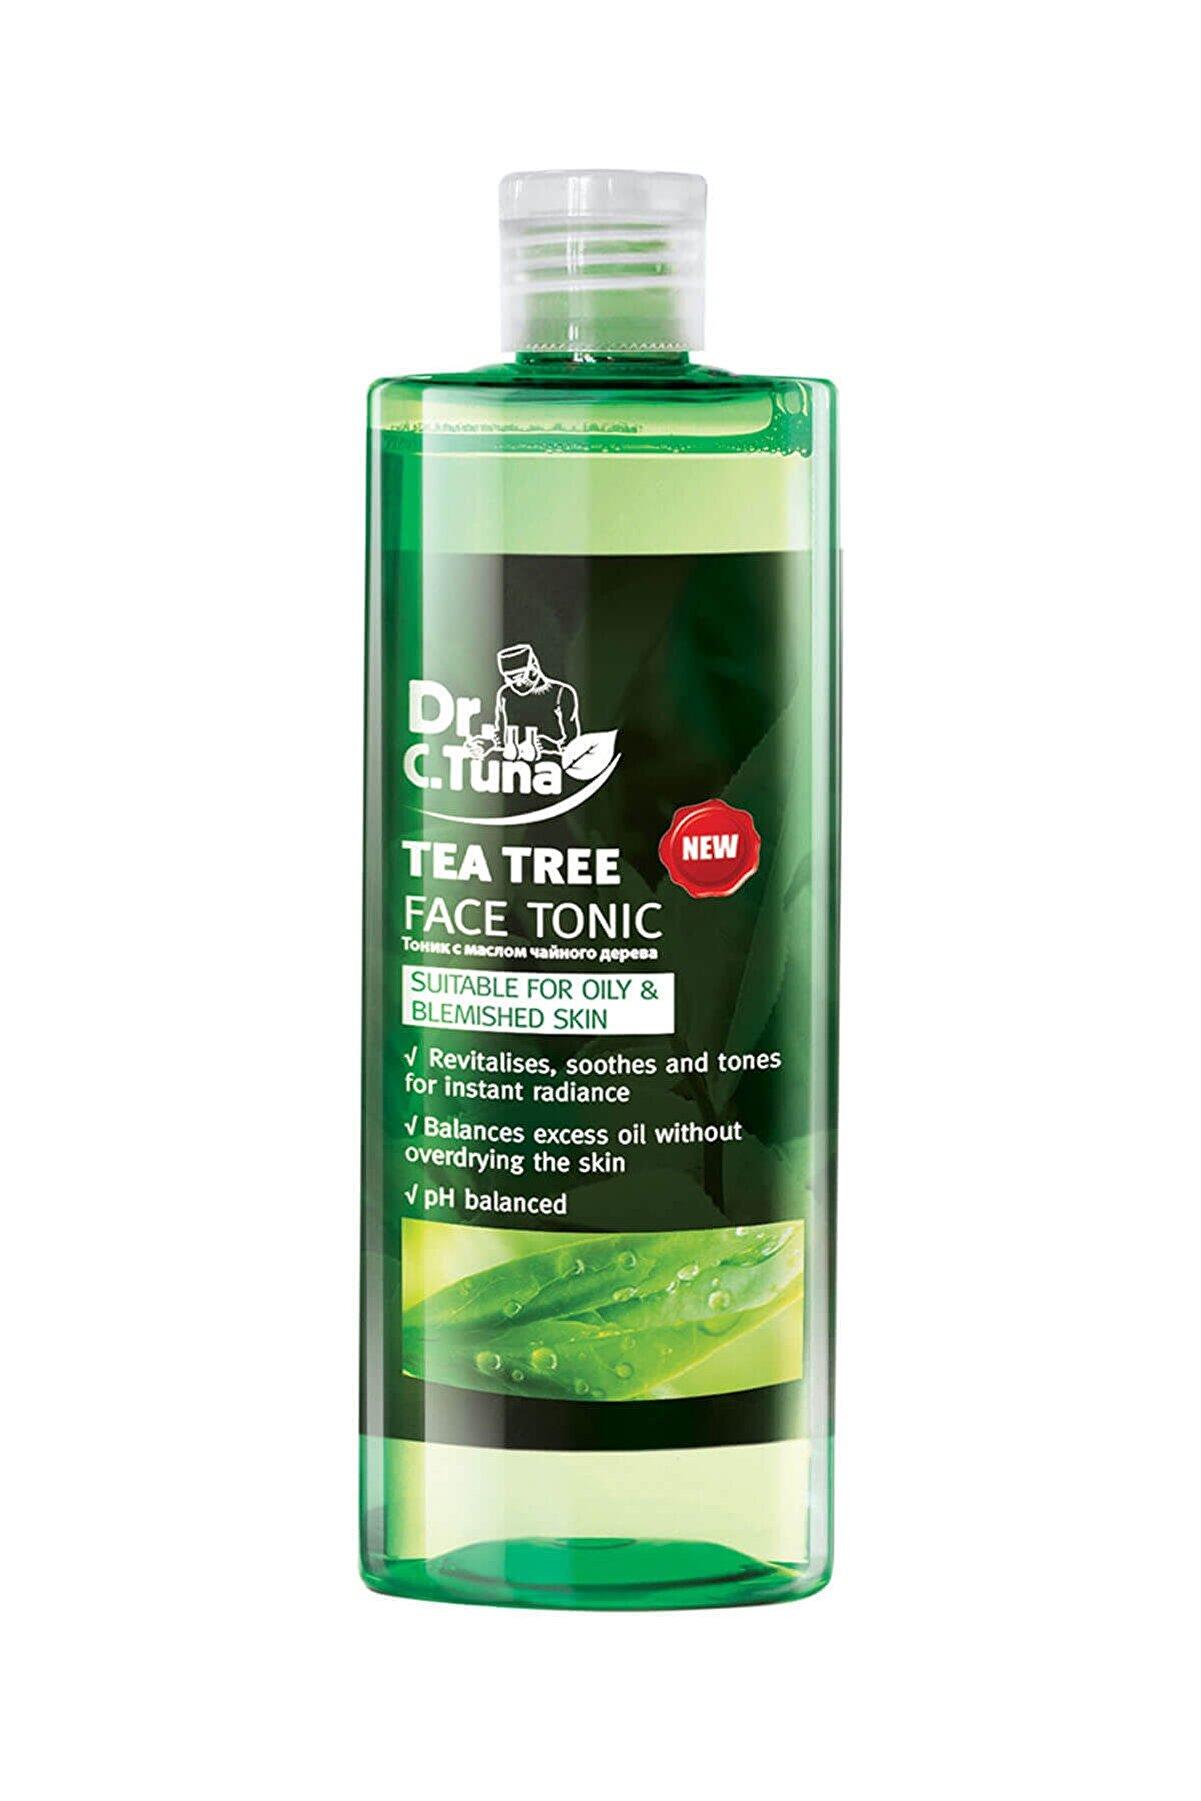 Farmasi Dr. C. Tuna Çay Ağacı Yağı Yüz Temizleme Toniği 225 ml